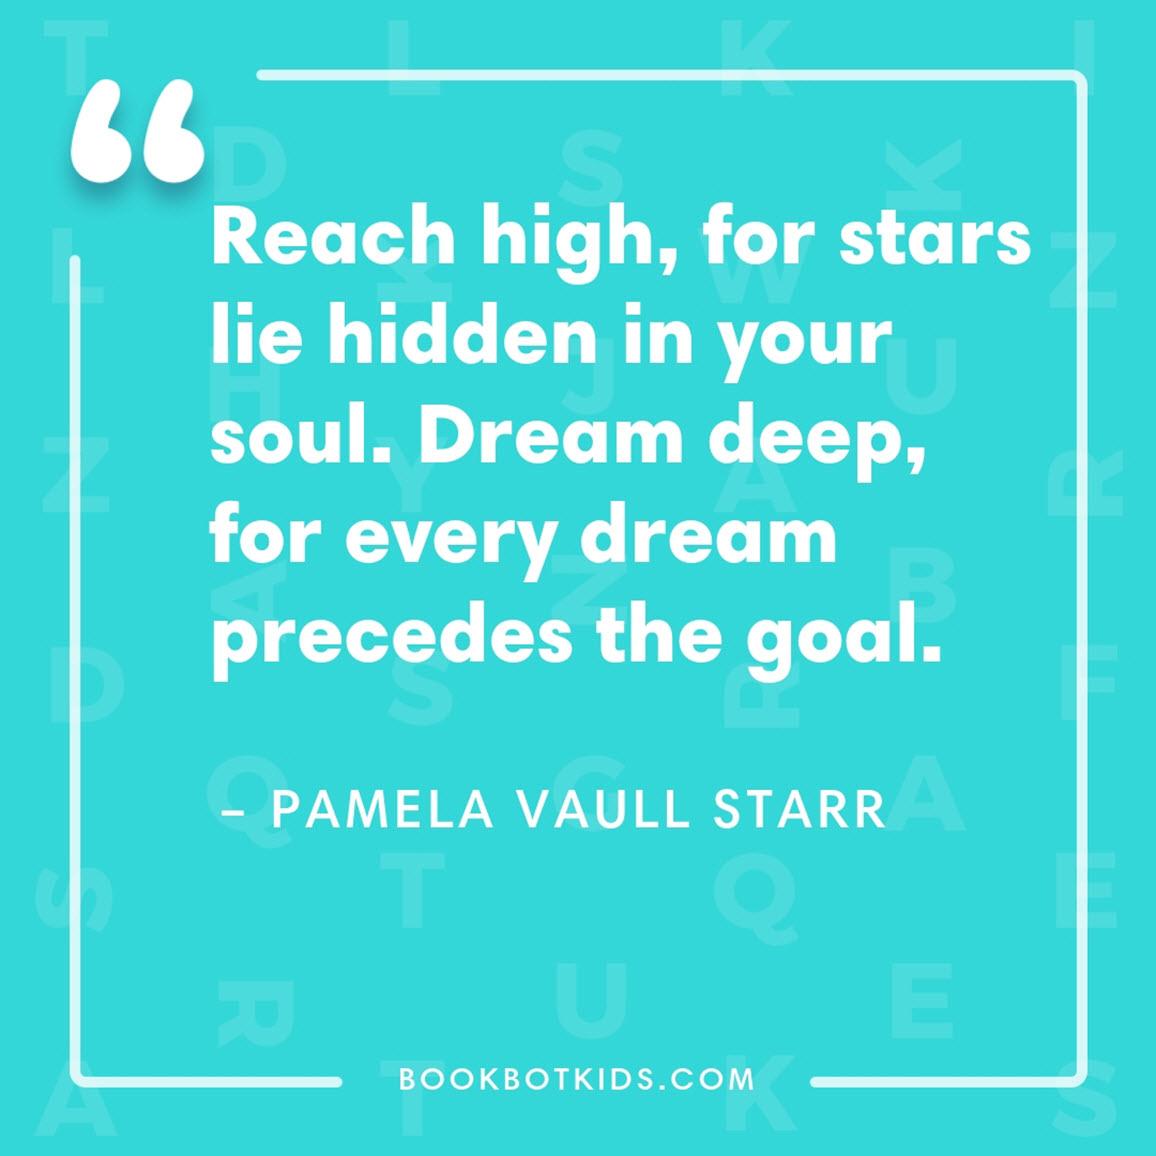 Reach high, for stars lie hidden in your soul. Dream deep, for every dream precedes the goal. – Pamela Vaull Starr